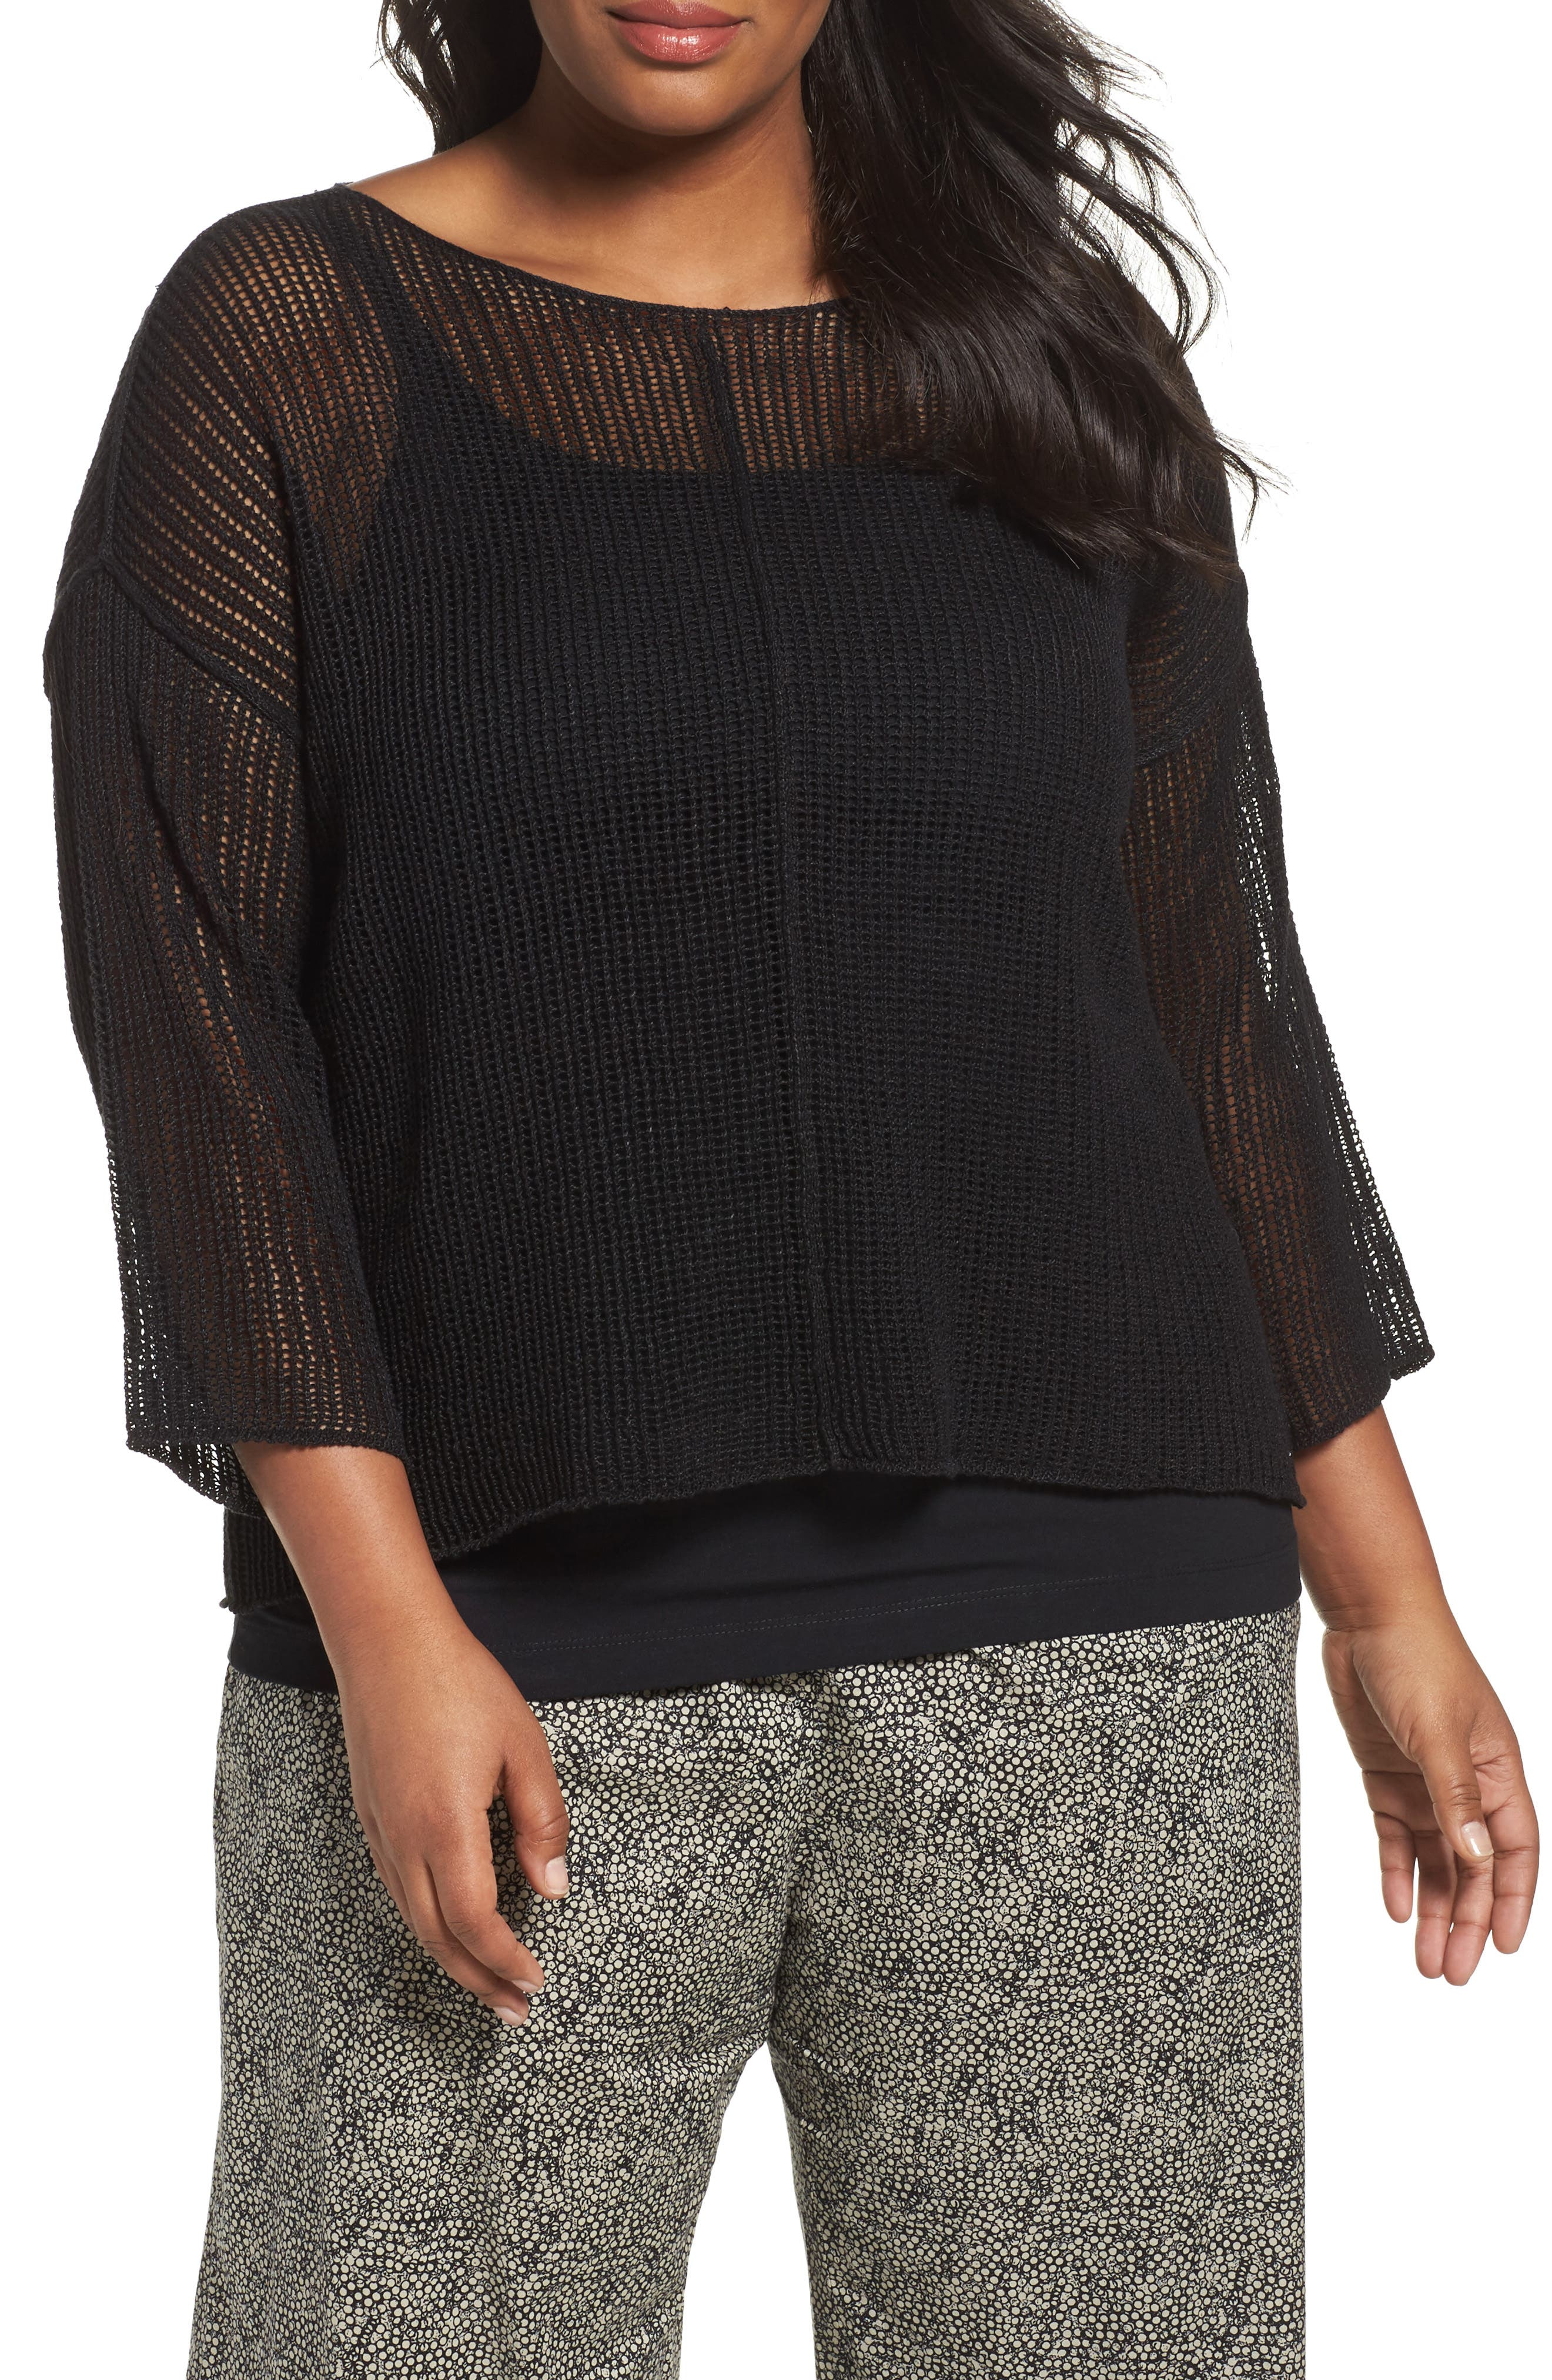 Organic Linen Mesh Knit Top,                             Main thumbnail 1, color,                             001